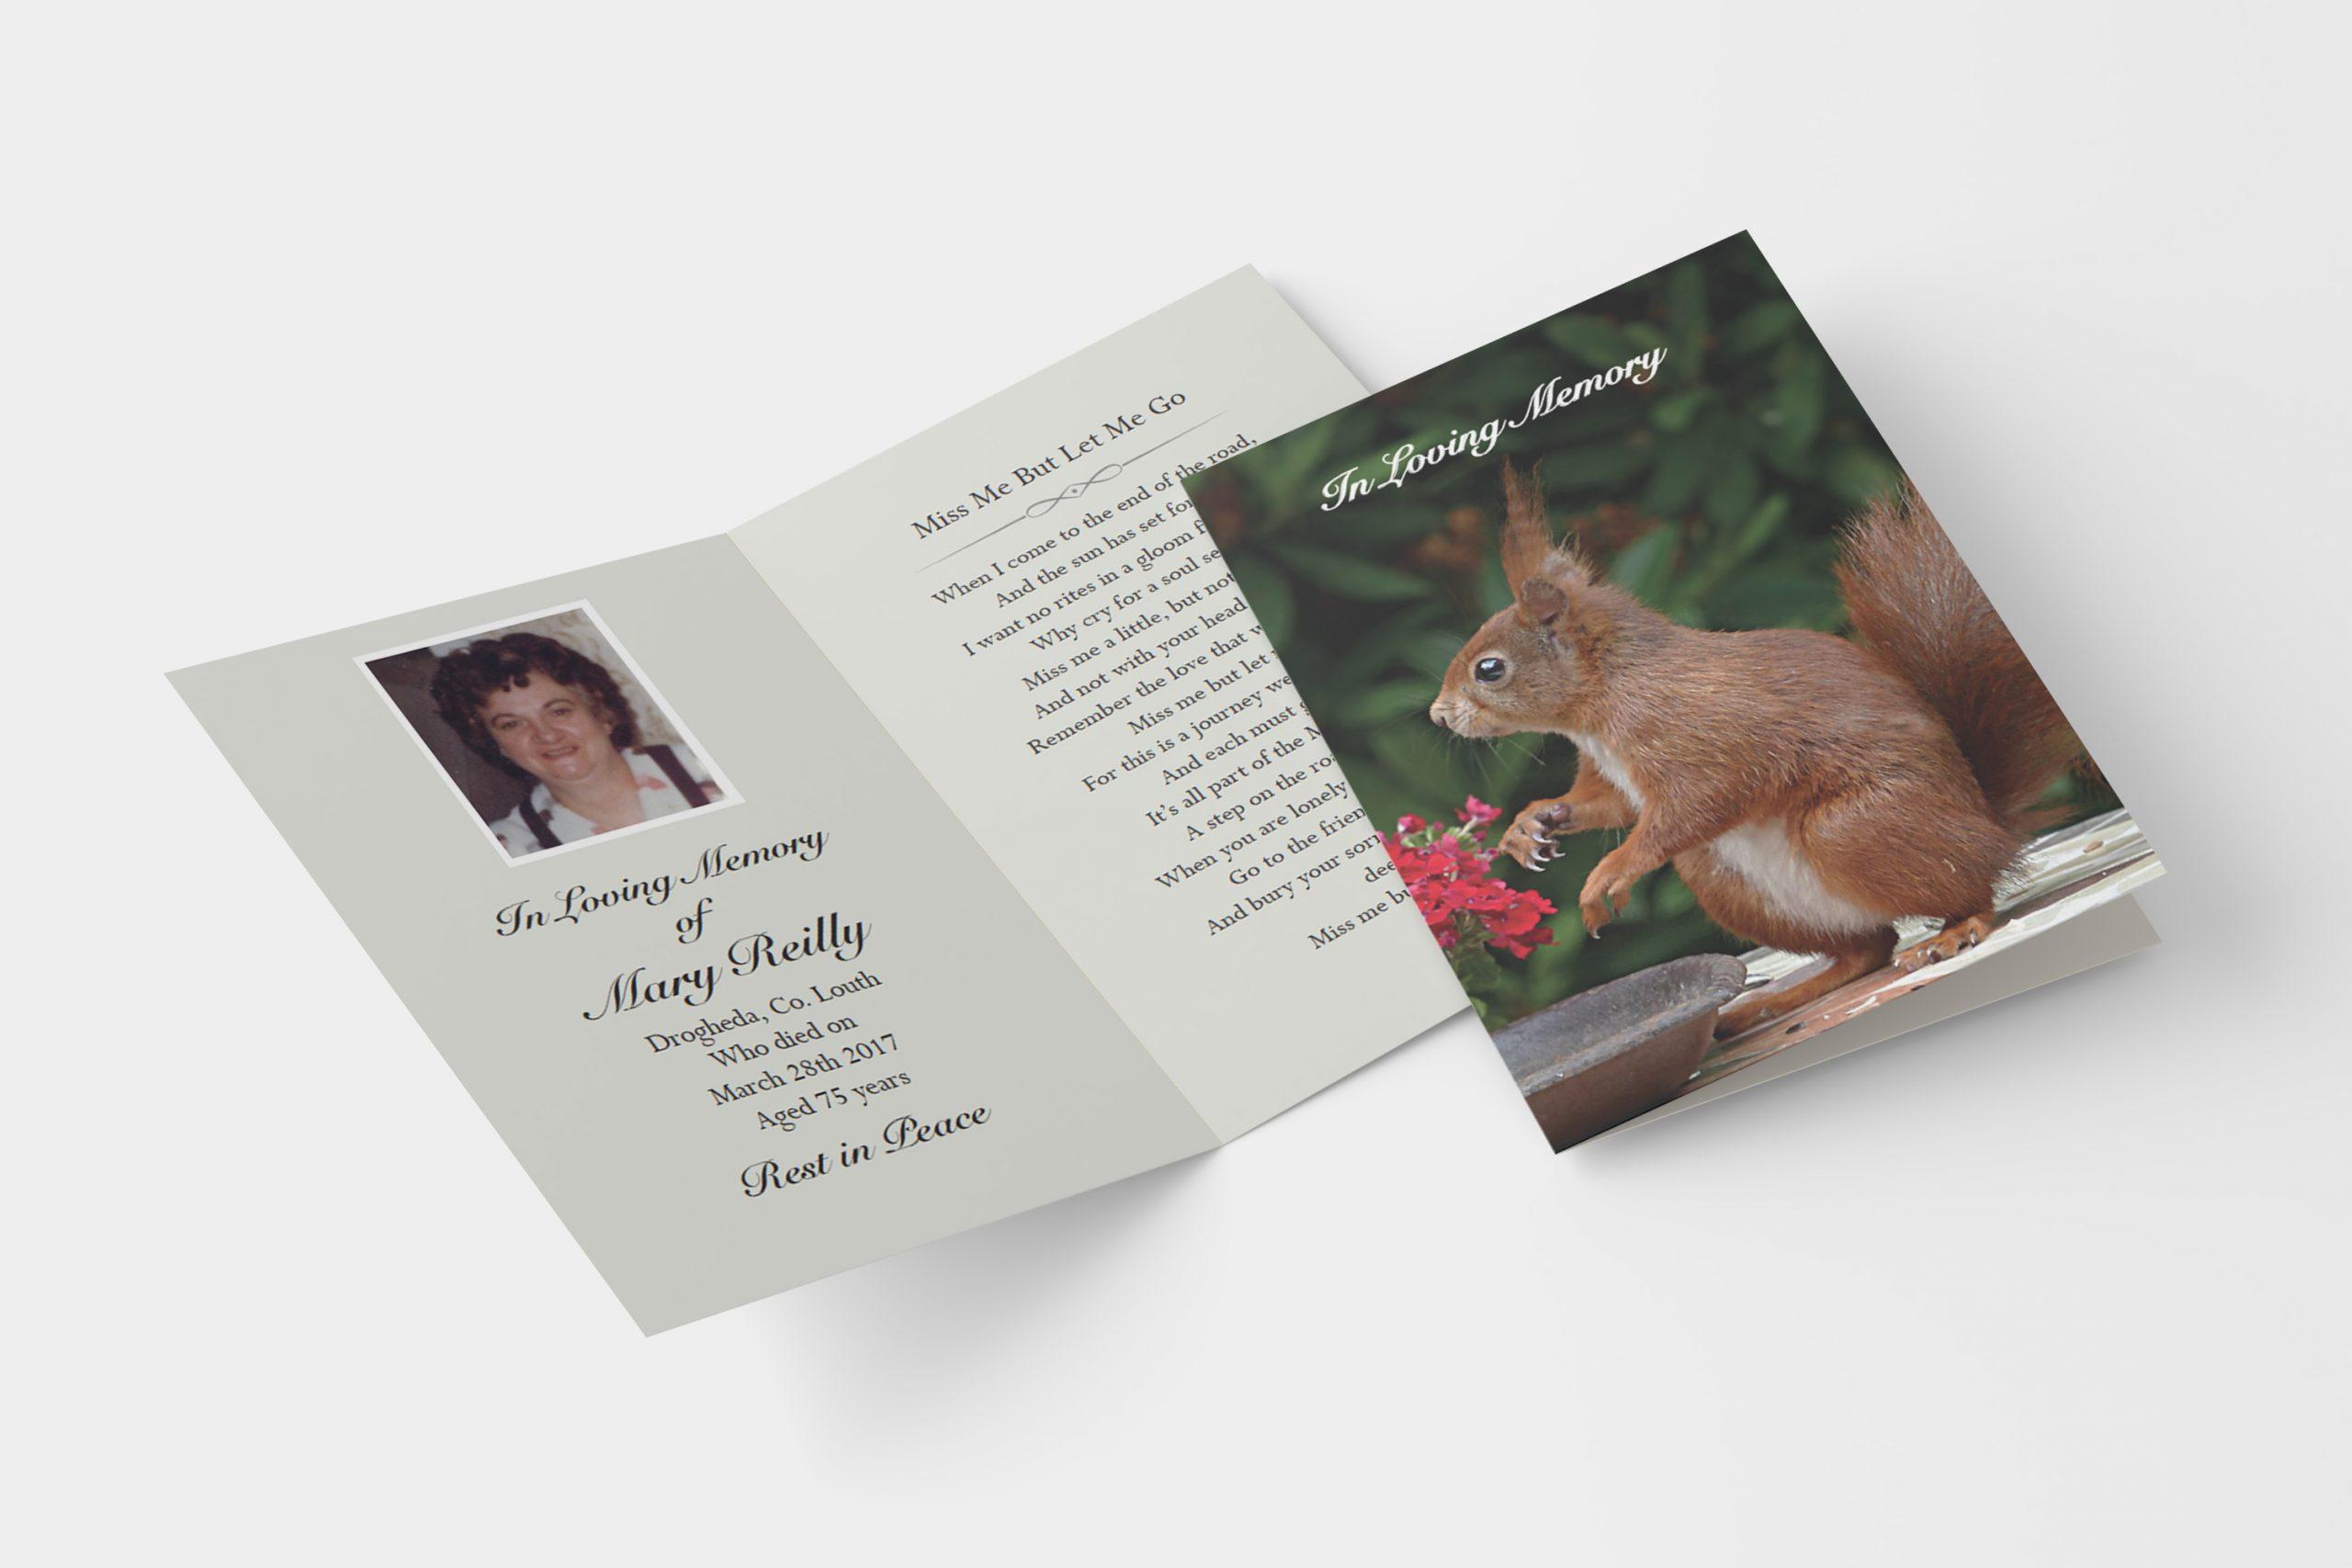 Squirrel folded memorial card